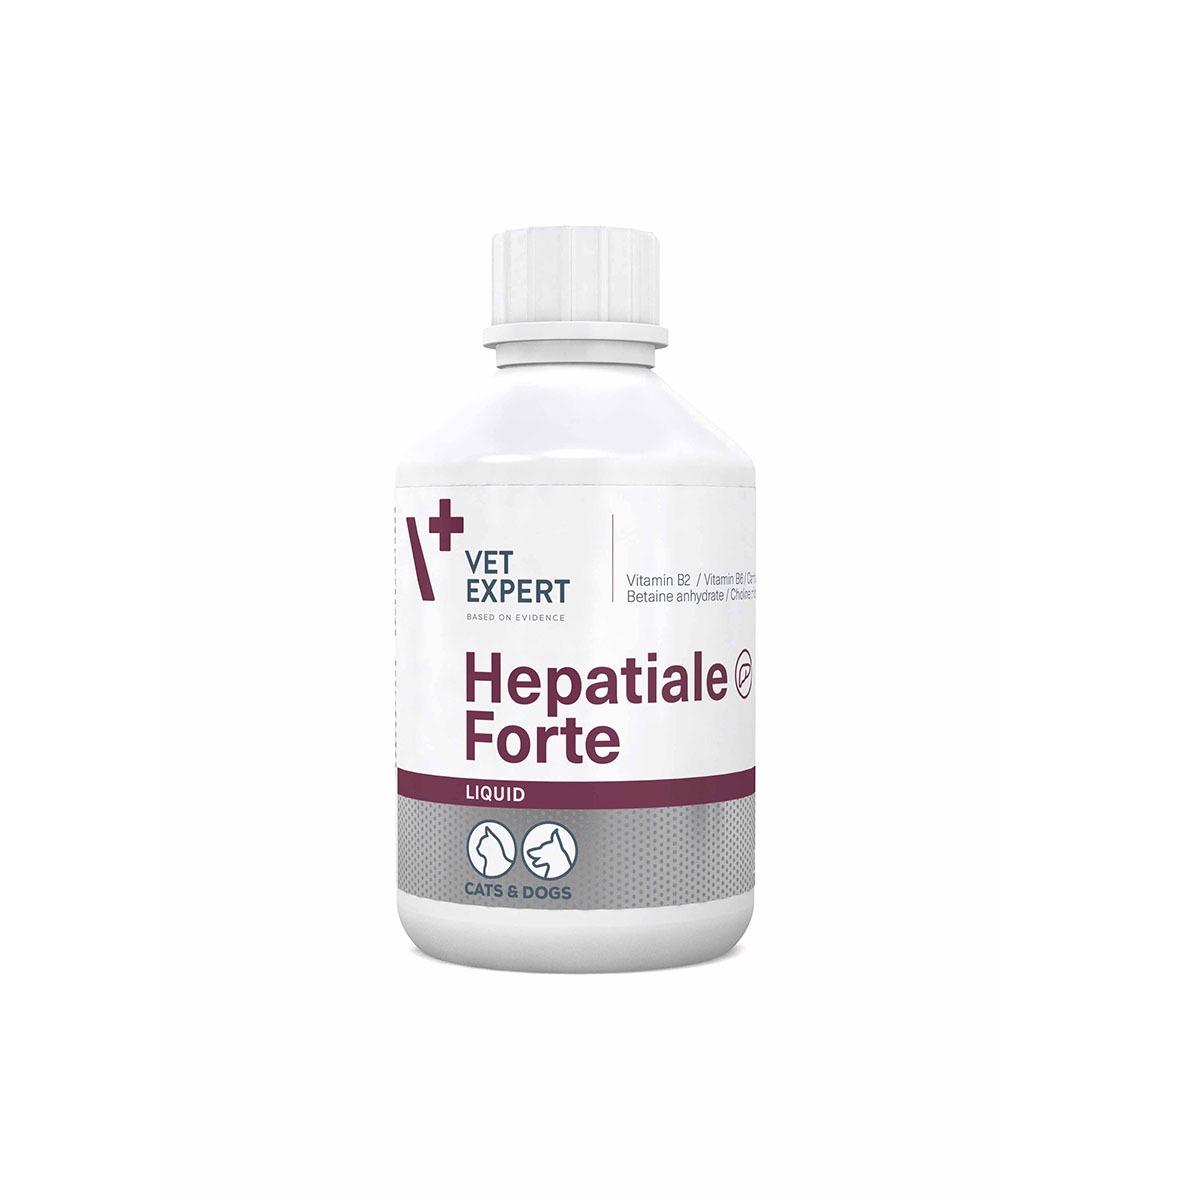 Vetexpert Hepatiale Forte liquid 250ml Diätergänzungsfuttermittel Tierarztbedarf, Veterinärbedarf, Veterinärmedizin, Praxisbedarf, Ergänzungsfuttermittel, Tierarztprodukten, Tierapotheke, Tierpflegeprodukte